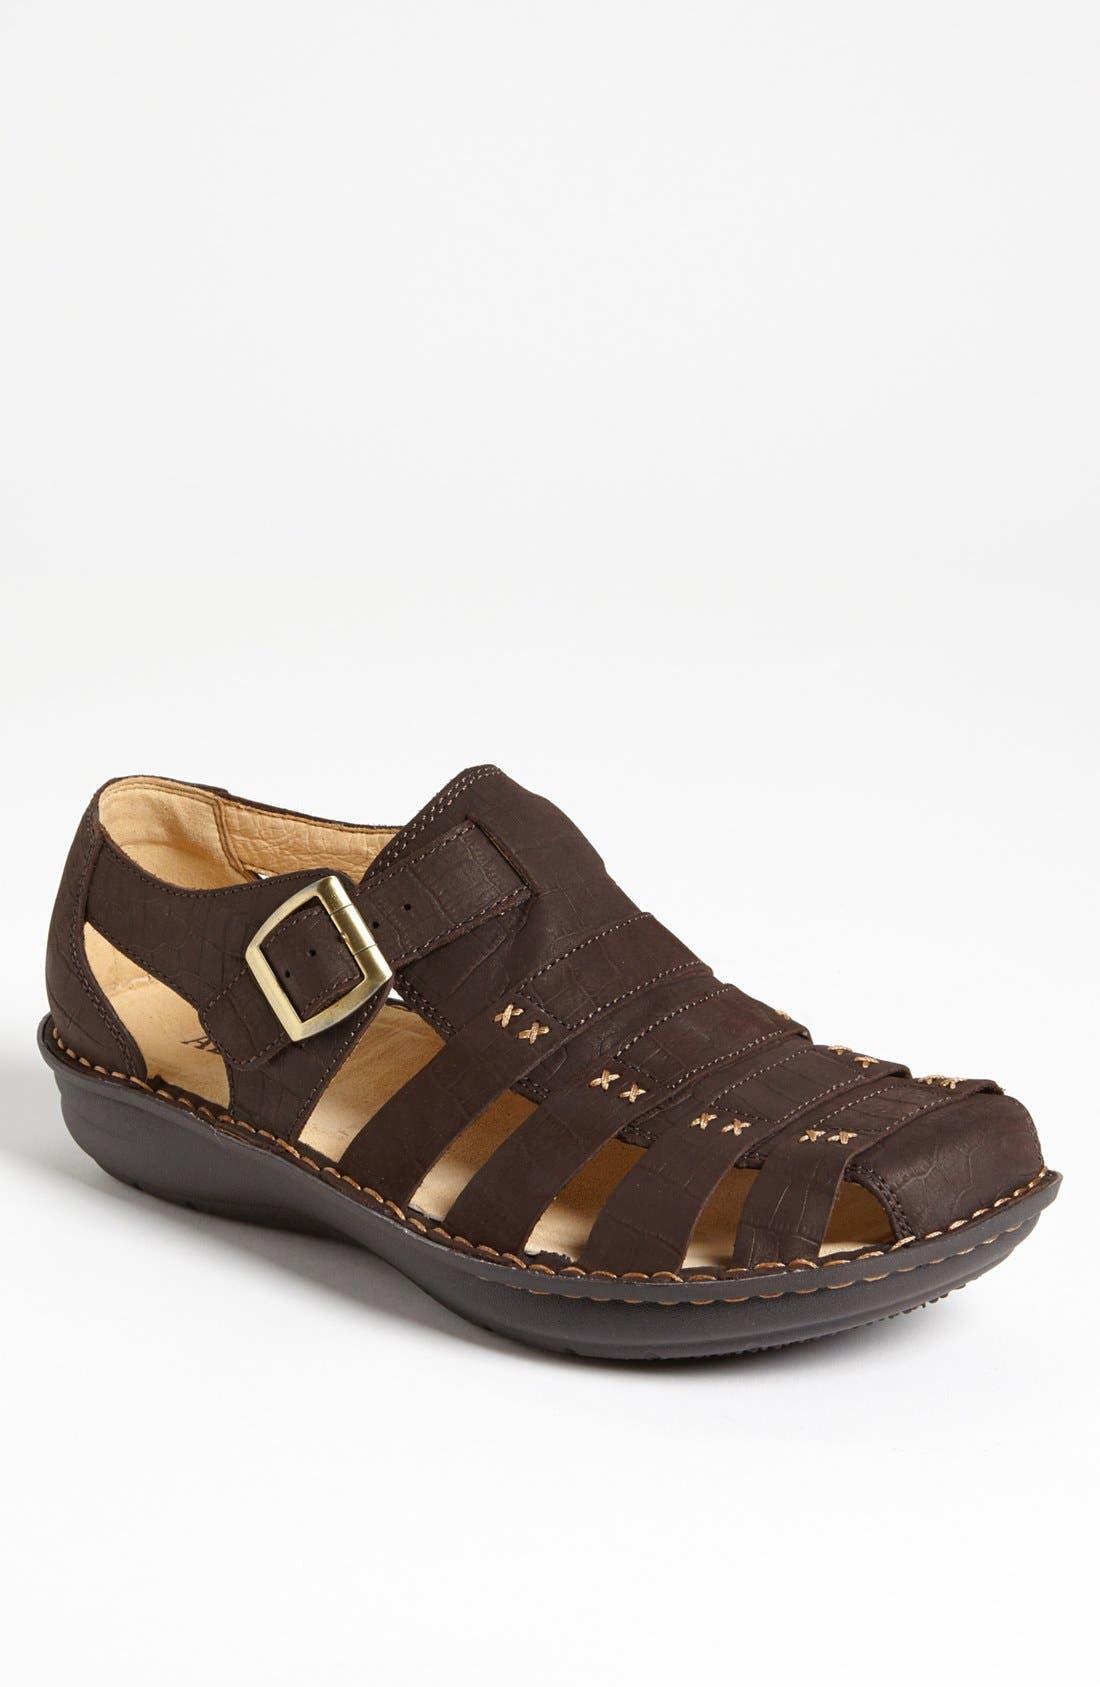 Main Image - Alegria 'Martinique' Sandal